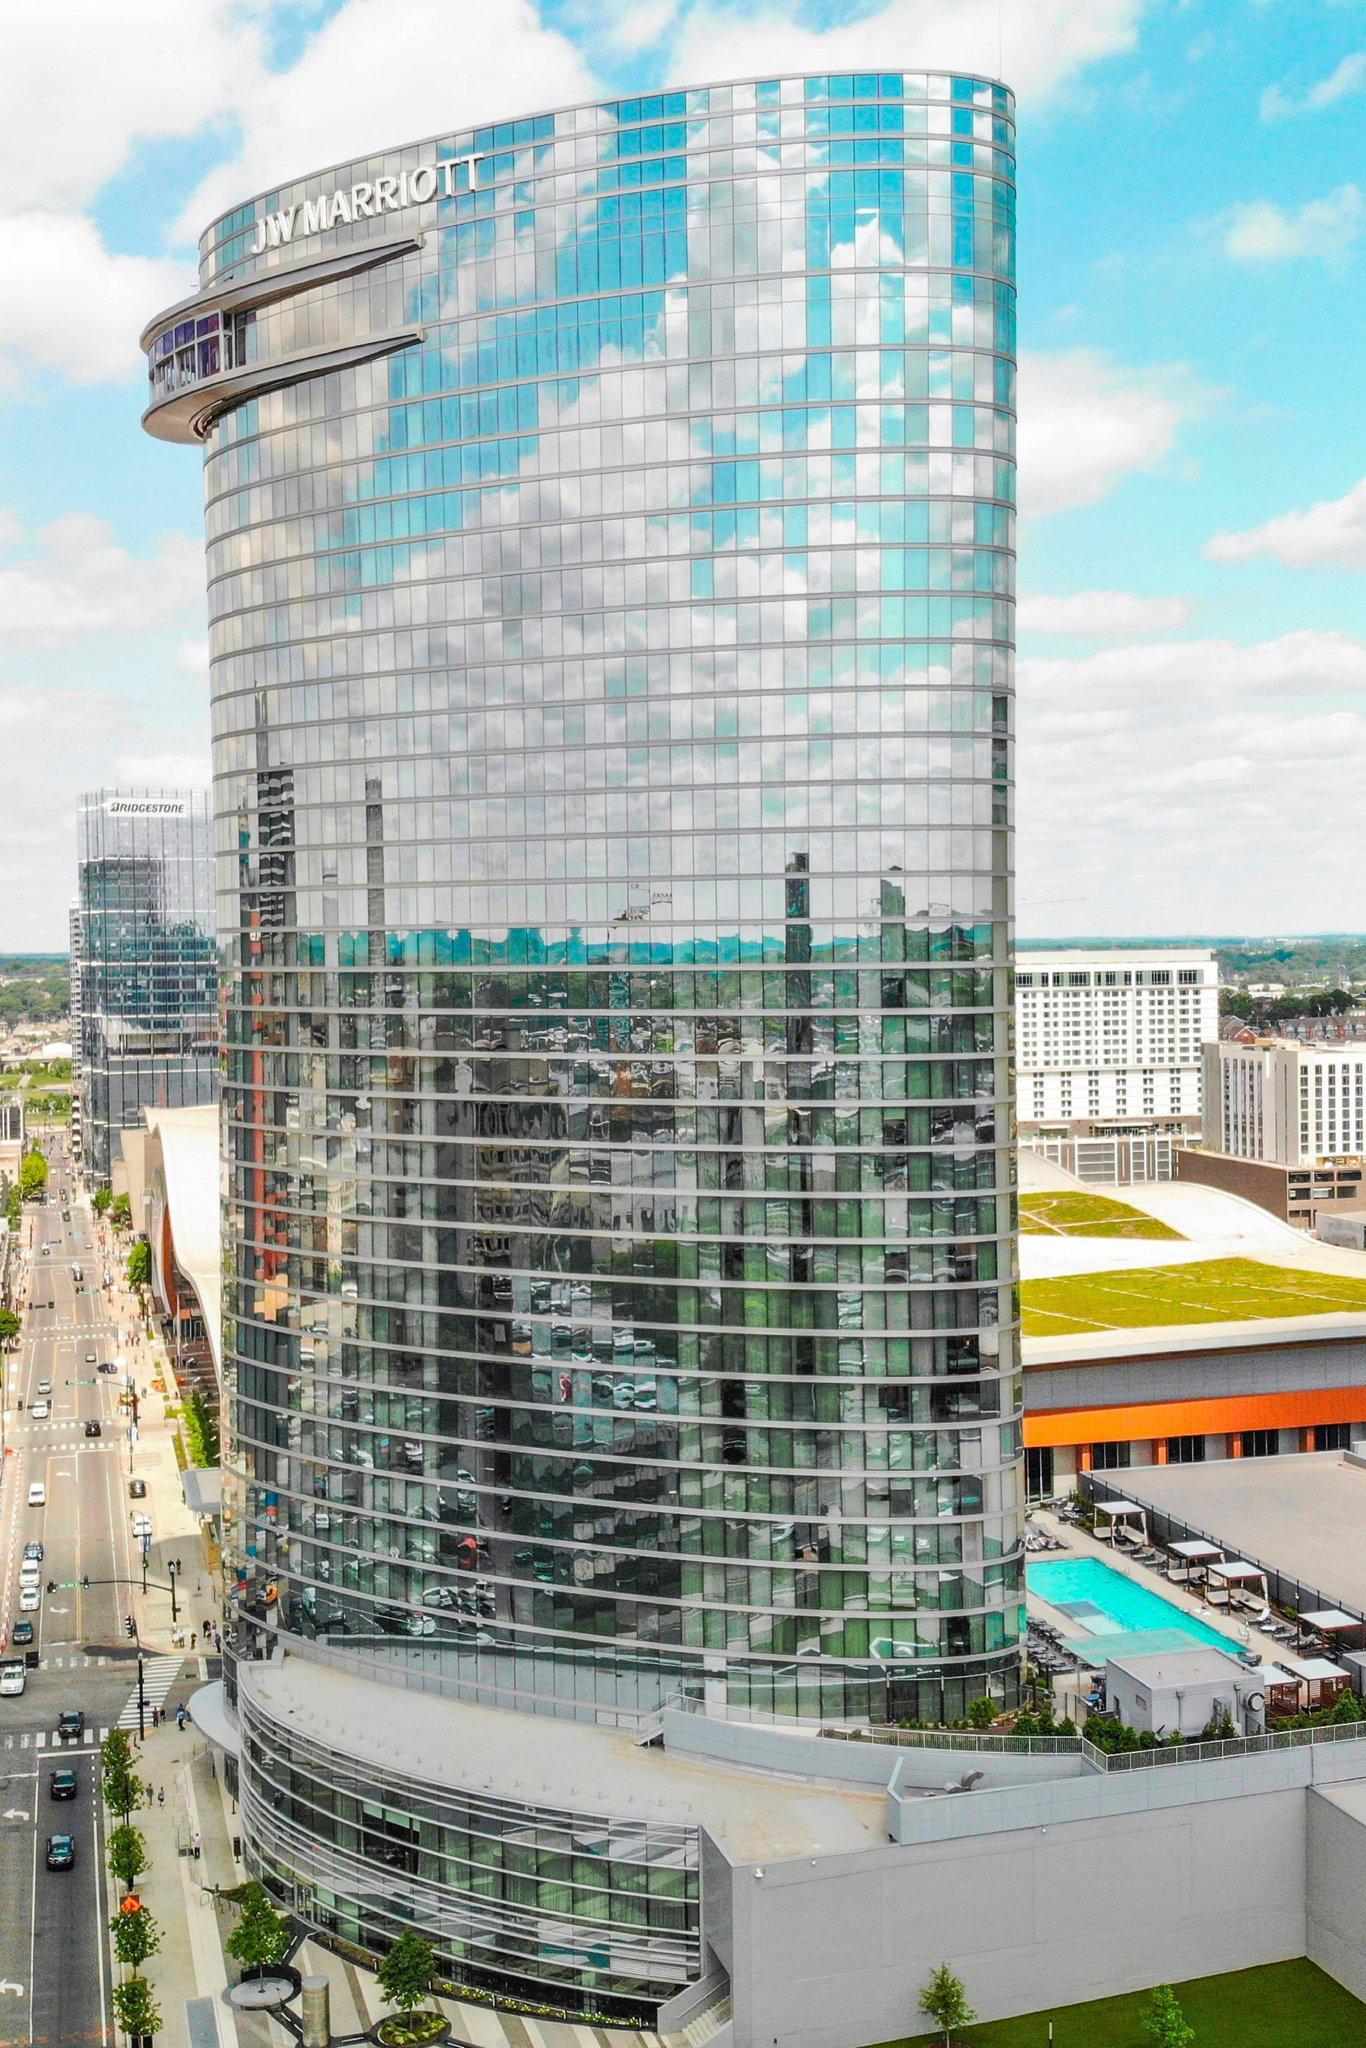 JW Marriott Nashville